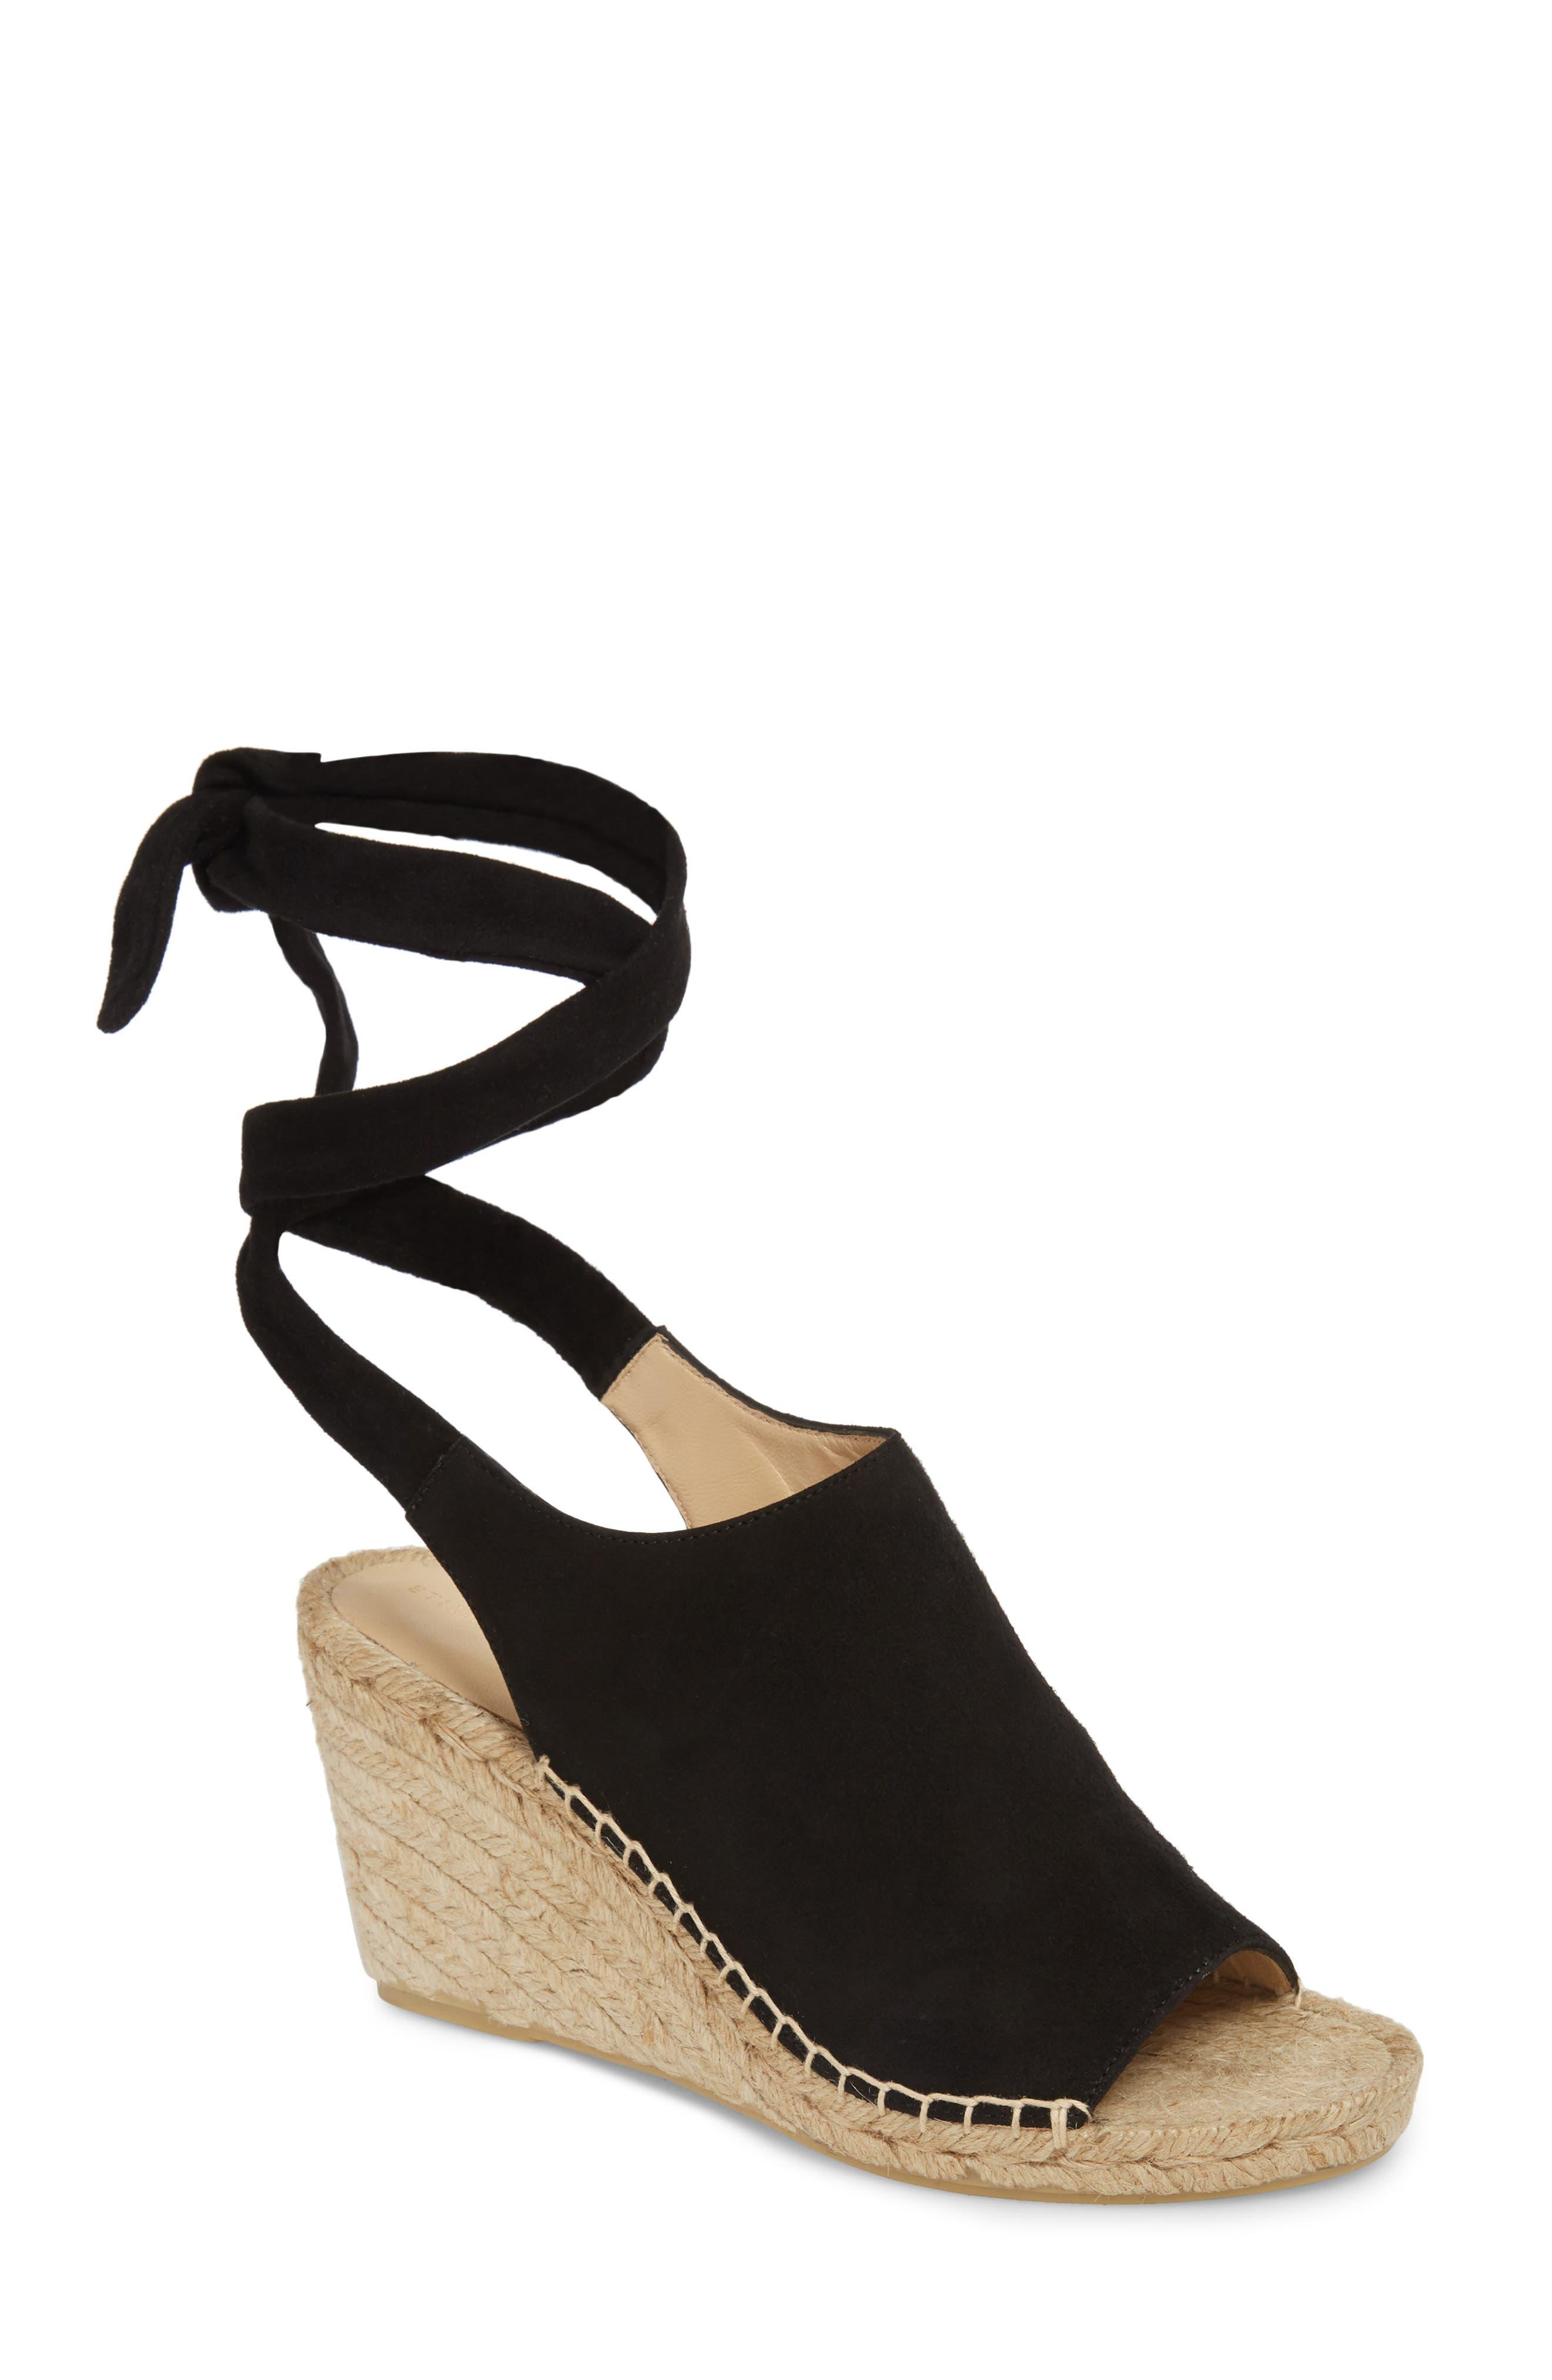 Vie Espadrille Wedge Sandal,                         Main,                         color, Black Suede